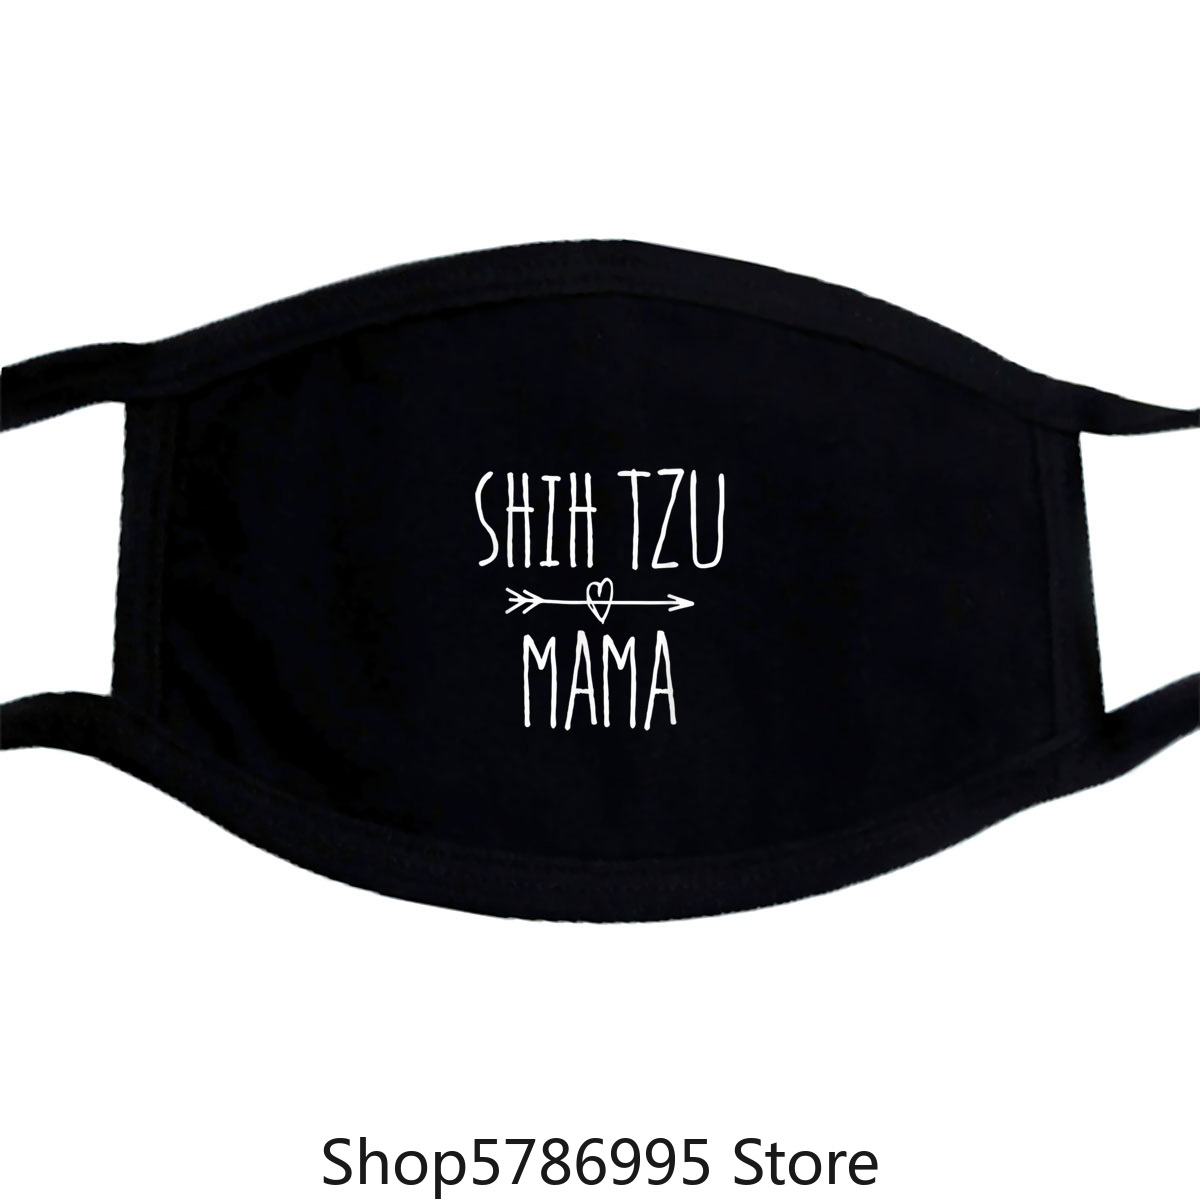 Beautiful Shih Tzu Mom Gifts Cute Shih Tzu Mama Mask